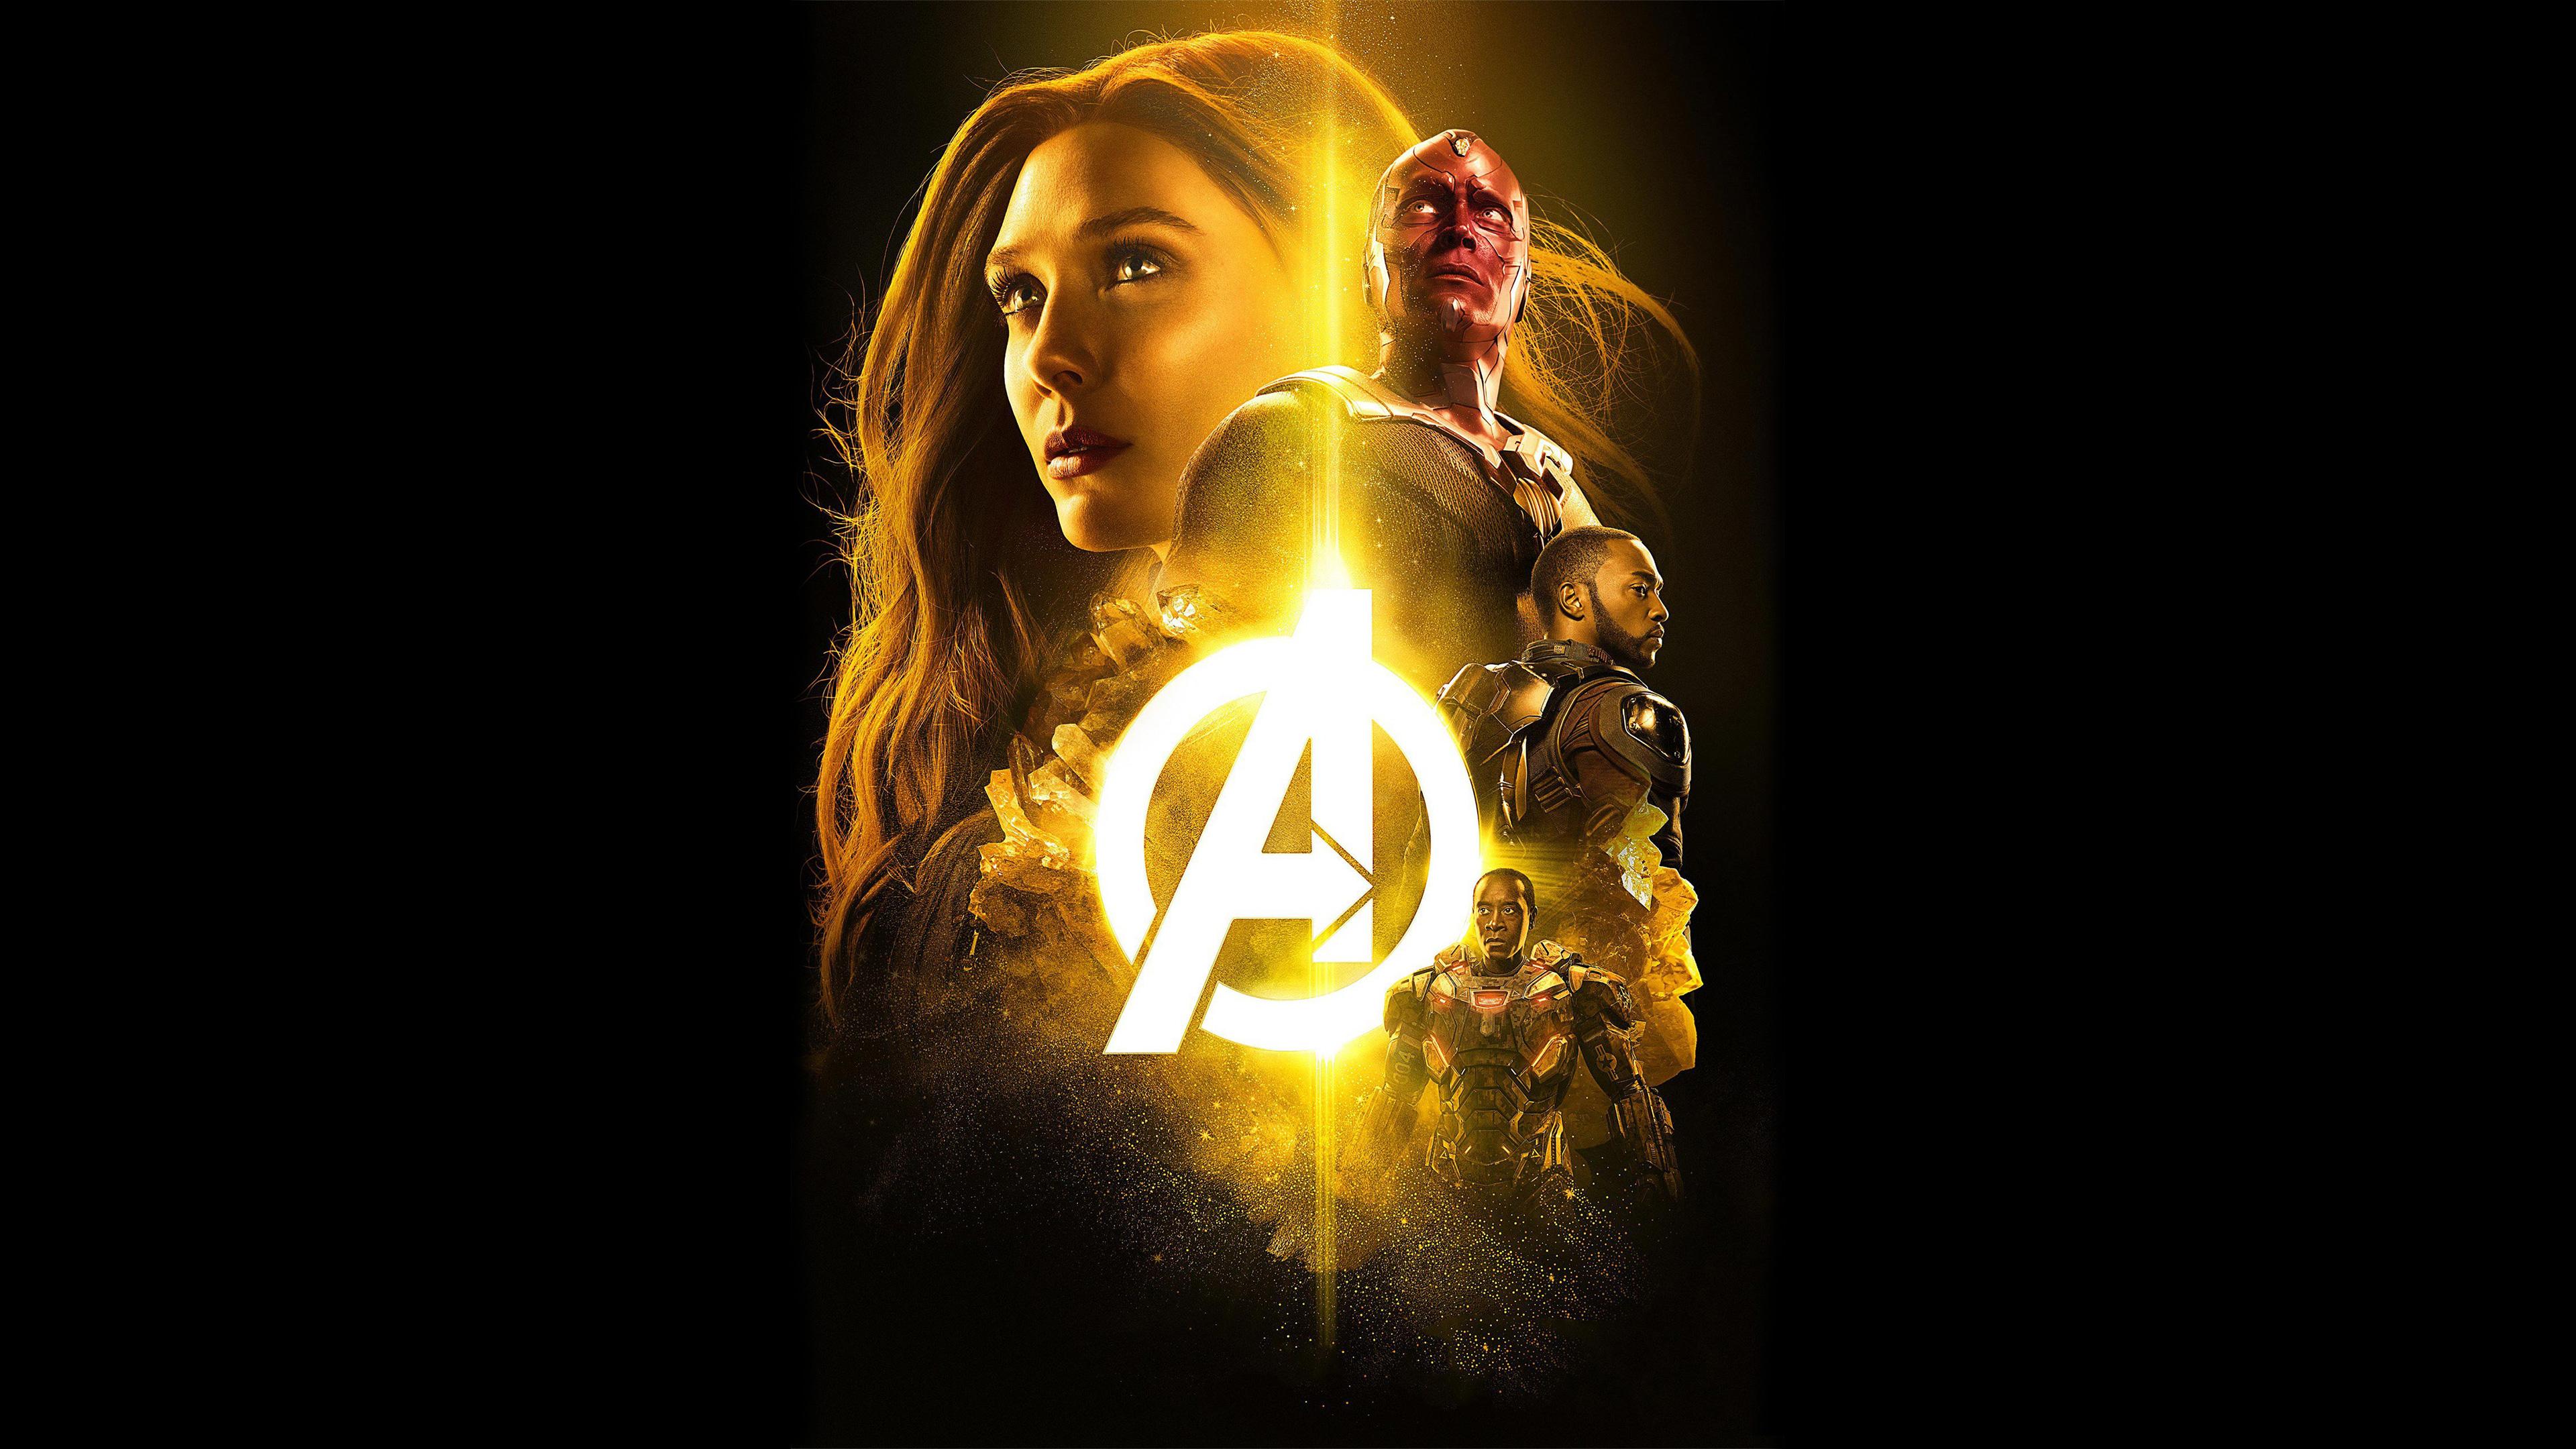 Fantastic Vision Wanda Infinity War Wallpaper - avengers-infinity-war-2018-the-mind-stone-poster-4k-g6  Snapshot_117714 .jpg